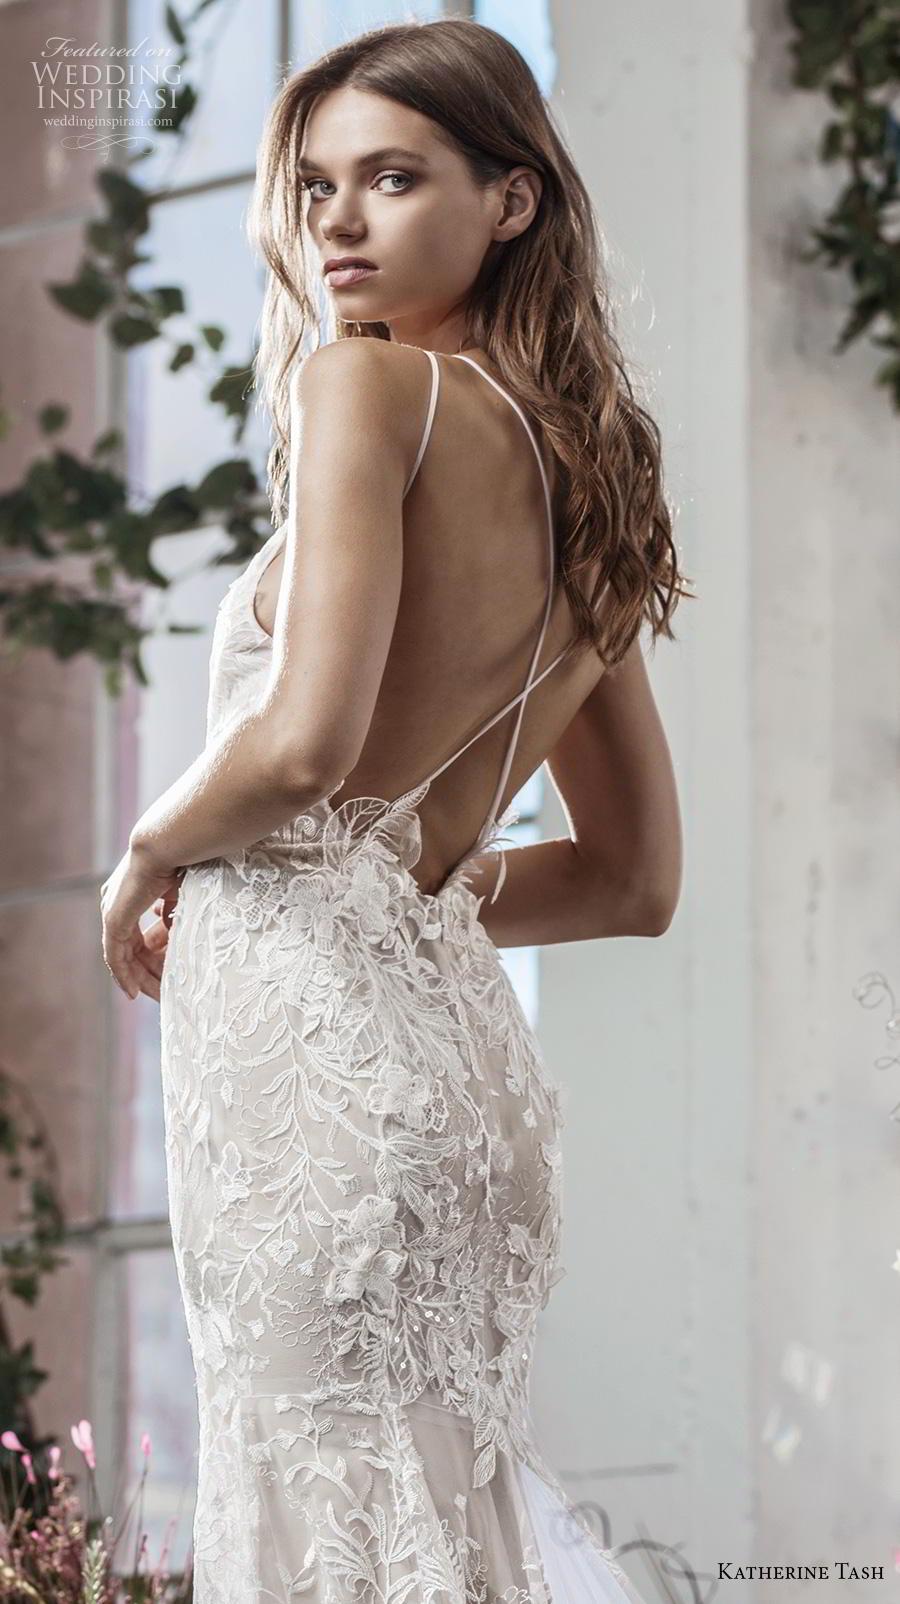 katherine tash fall 2019 bridal thin strap v neck full embellishment romantic blush fit and flare wedding dress cross strap medium train (6) zbv